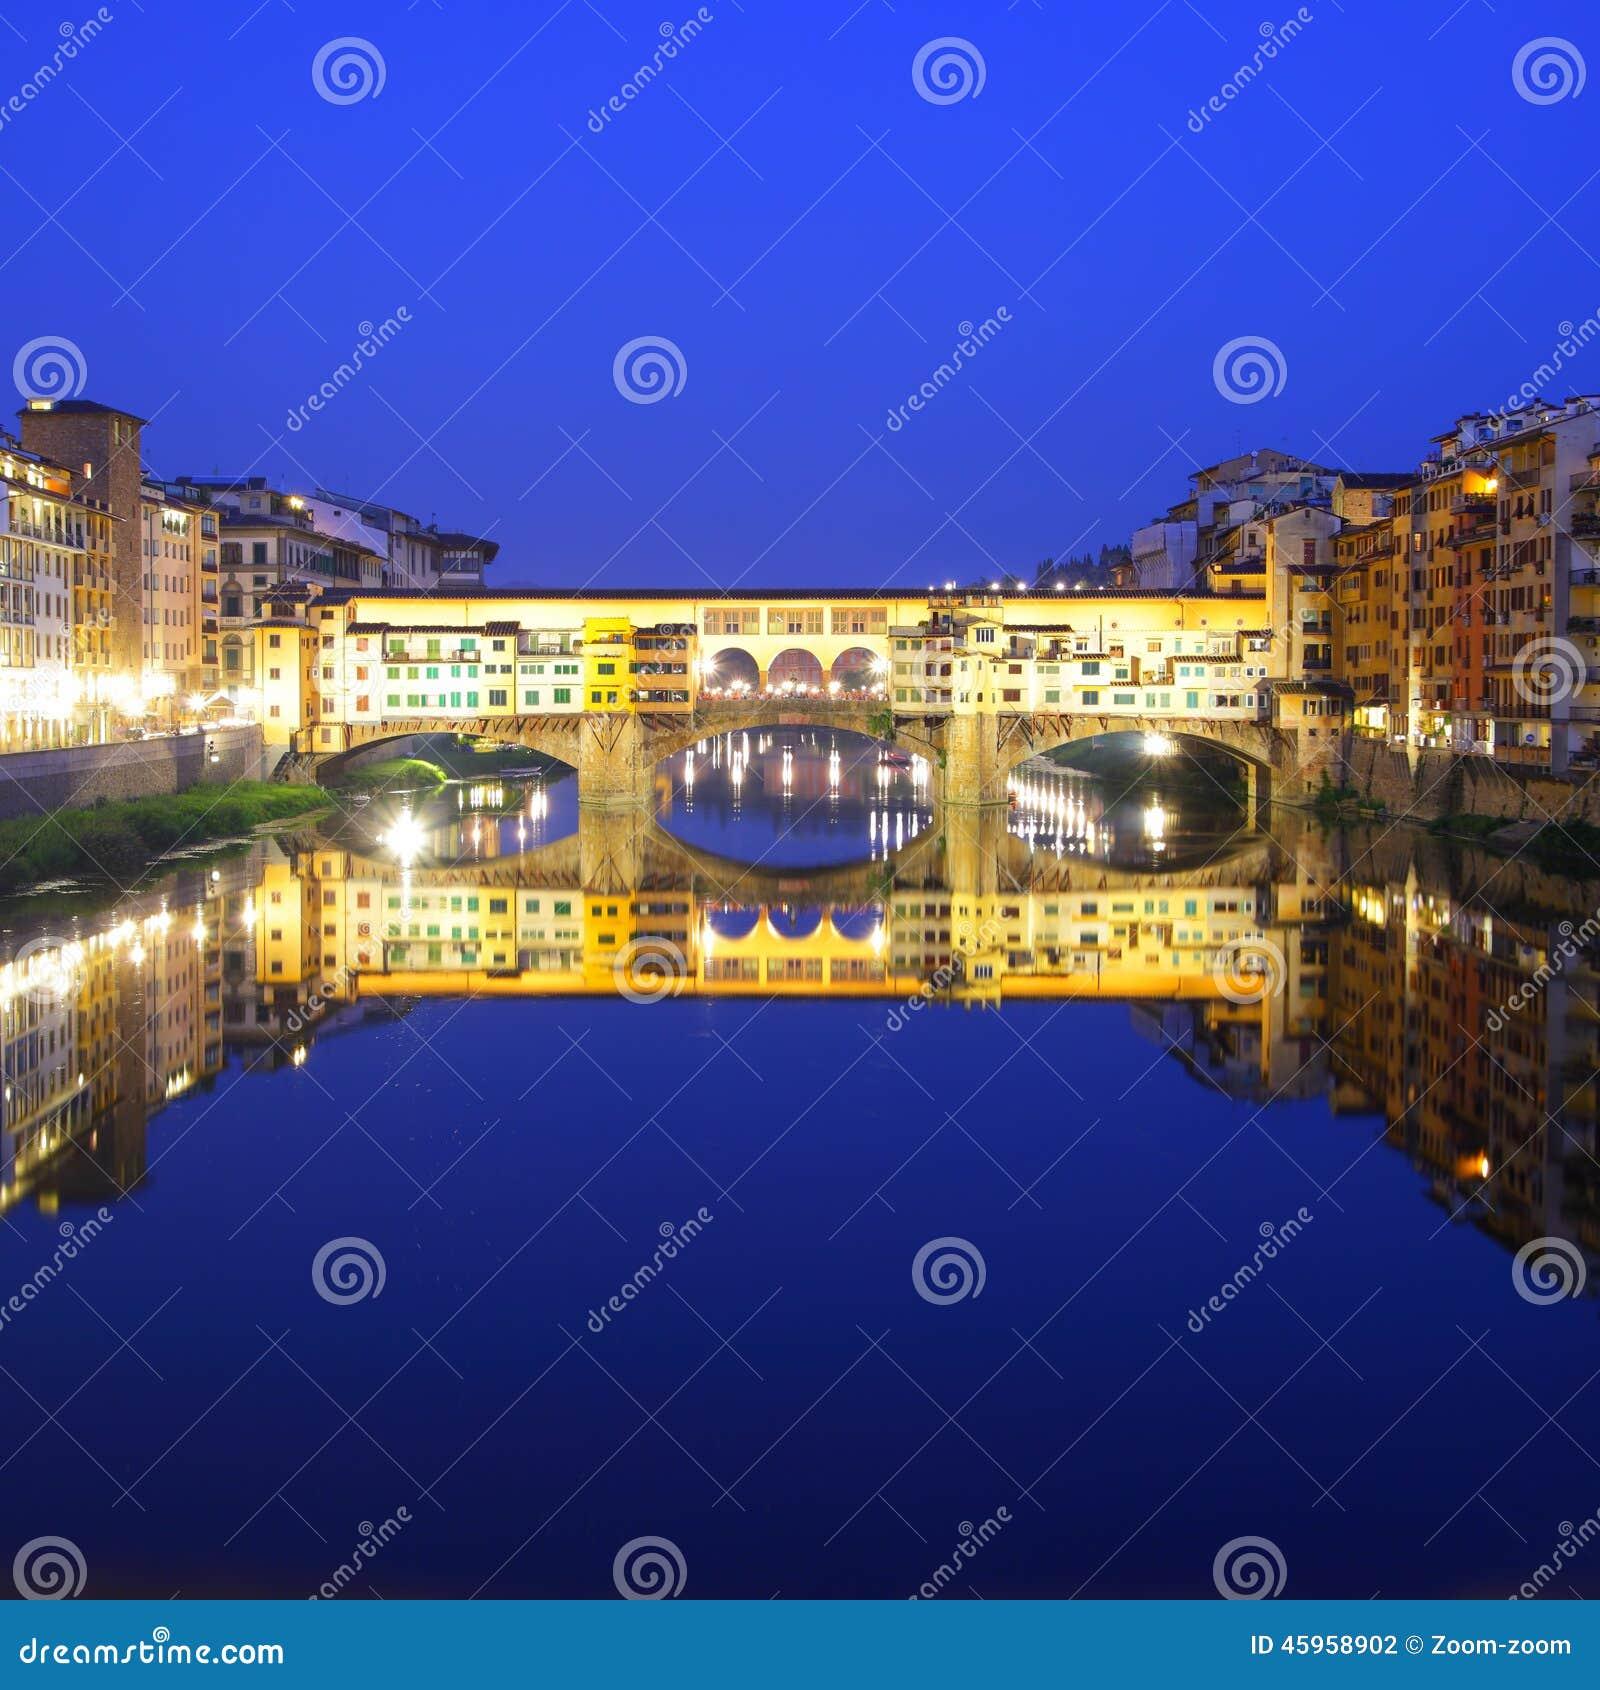 Ponte Vecchio Stock Photo - Image: 45958902